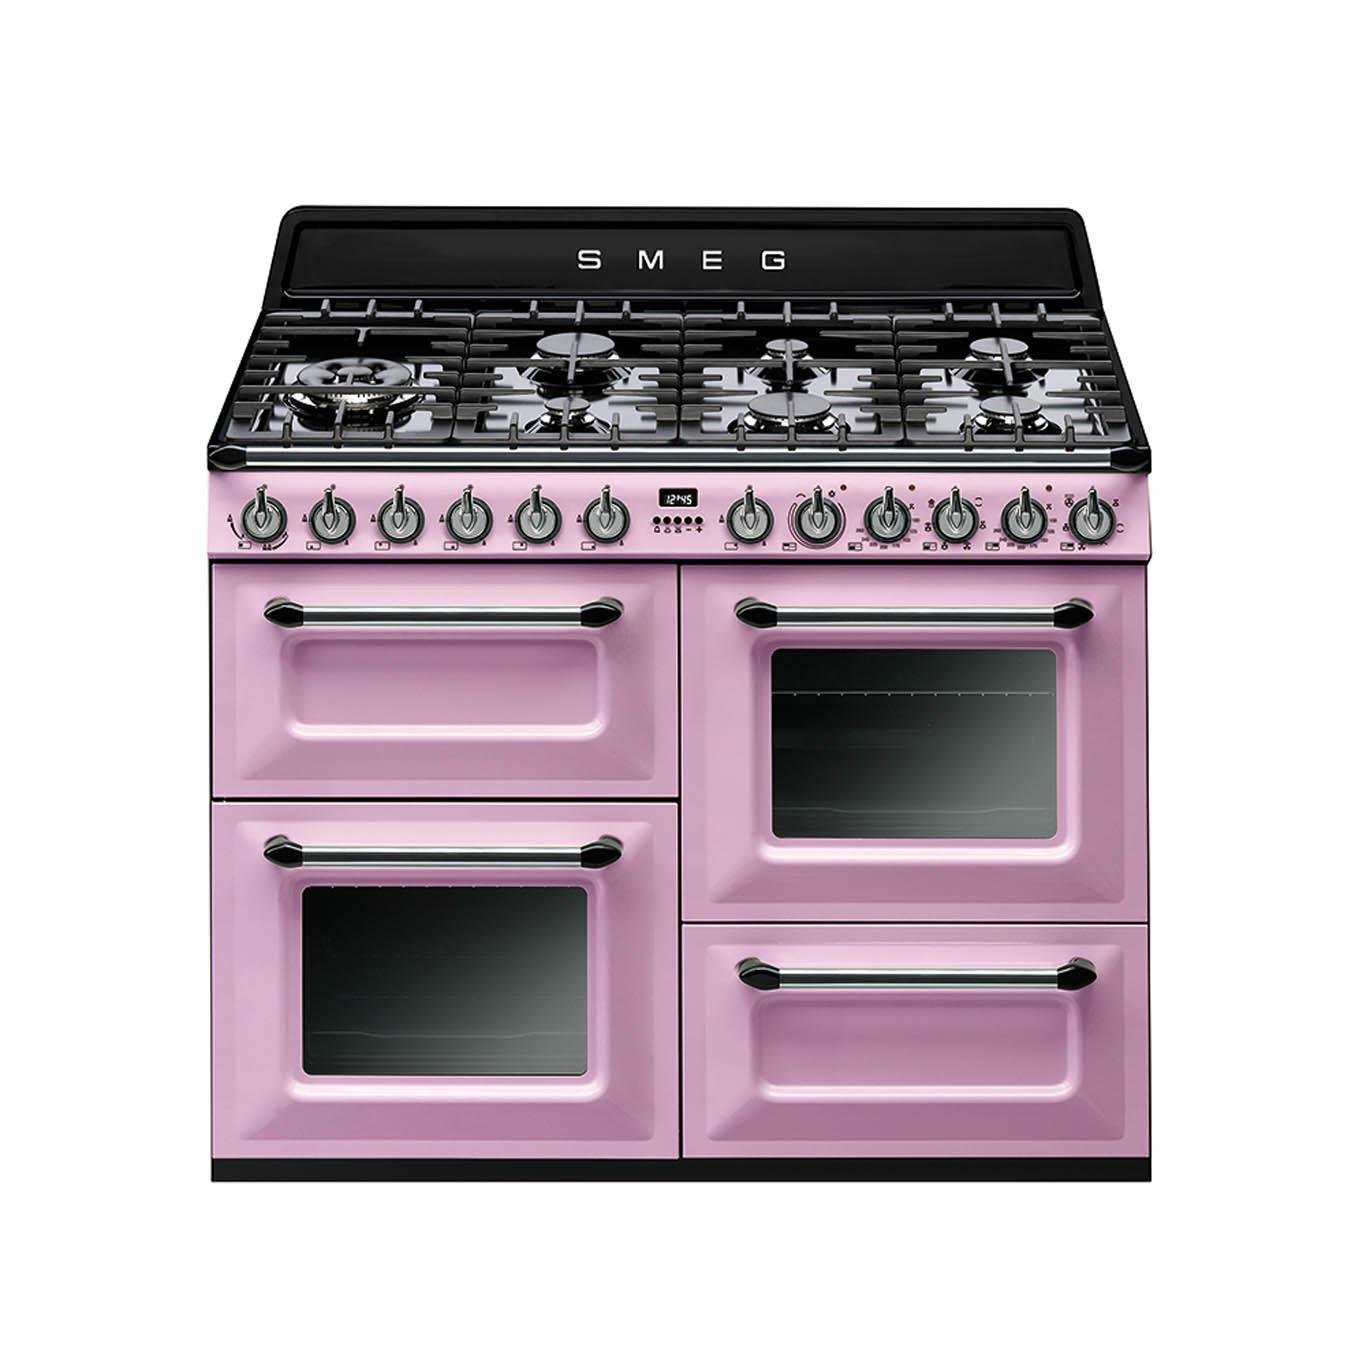 Smeg Victoria 110 Pink Dual Fuel Range Cooker